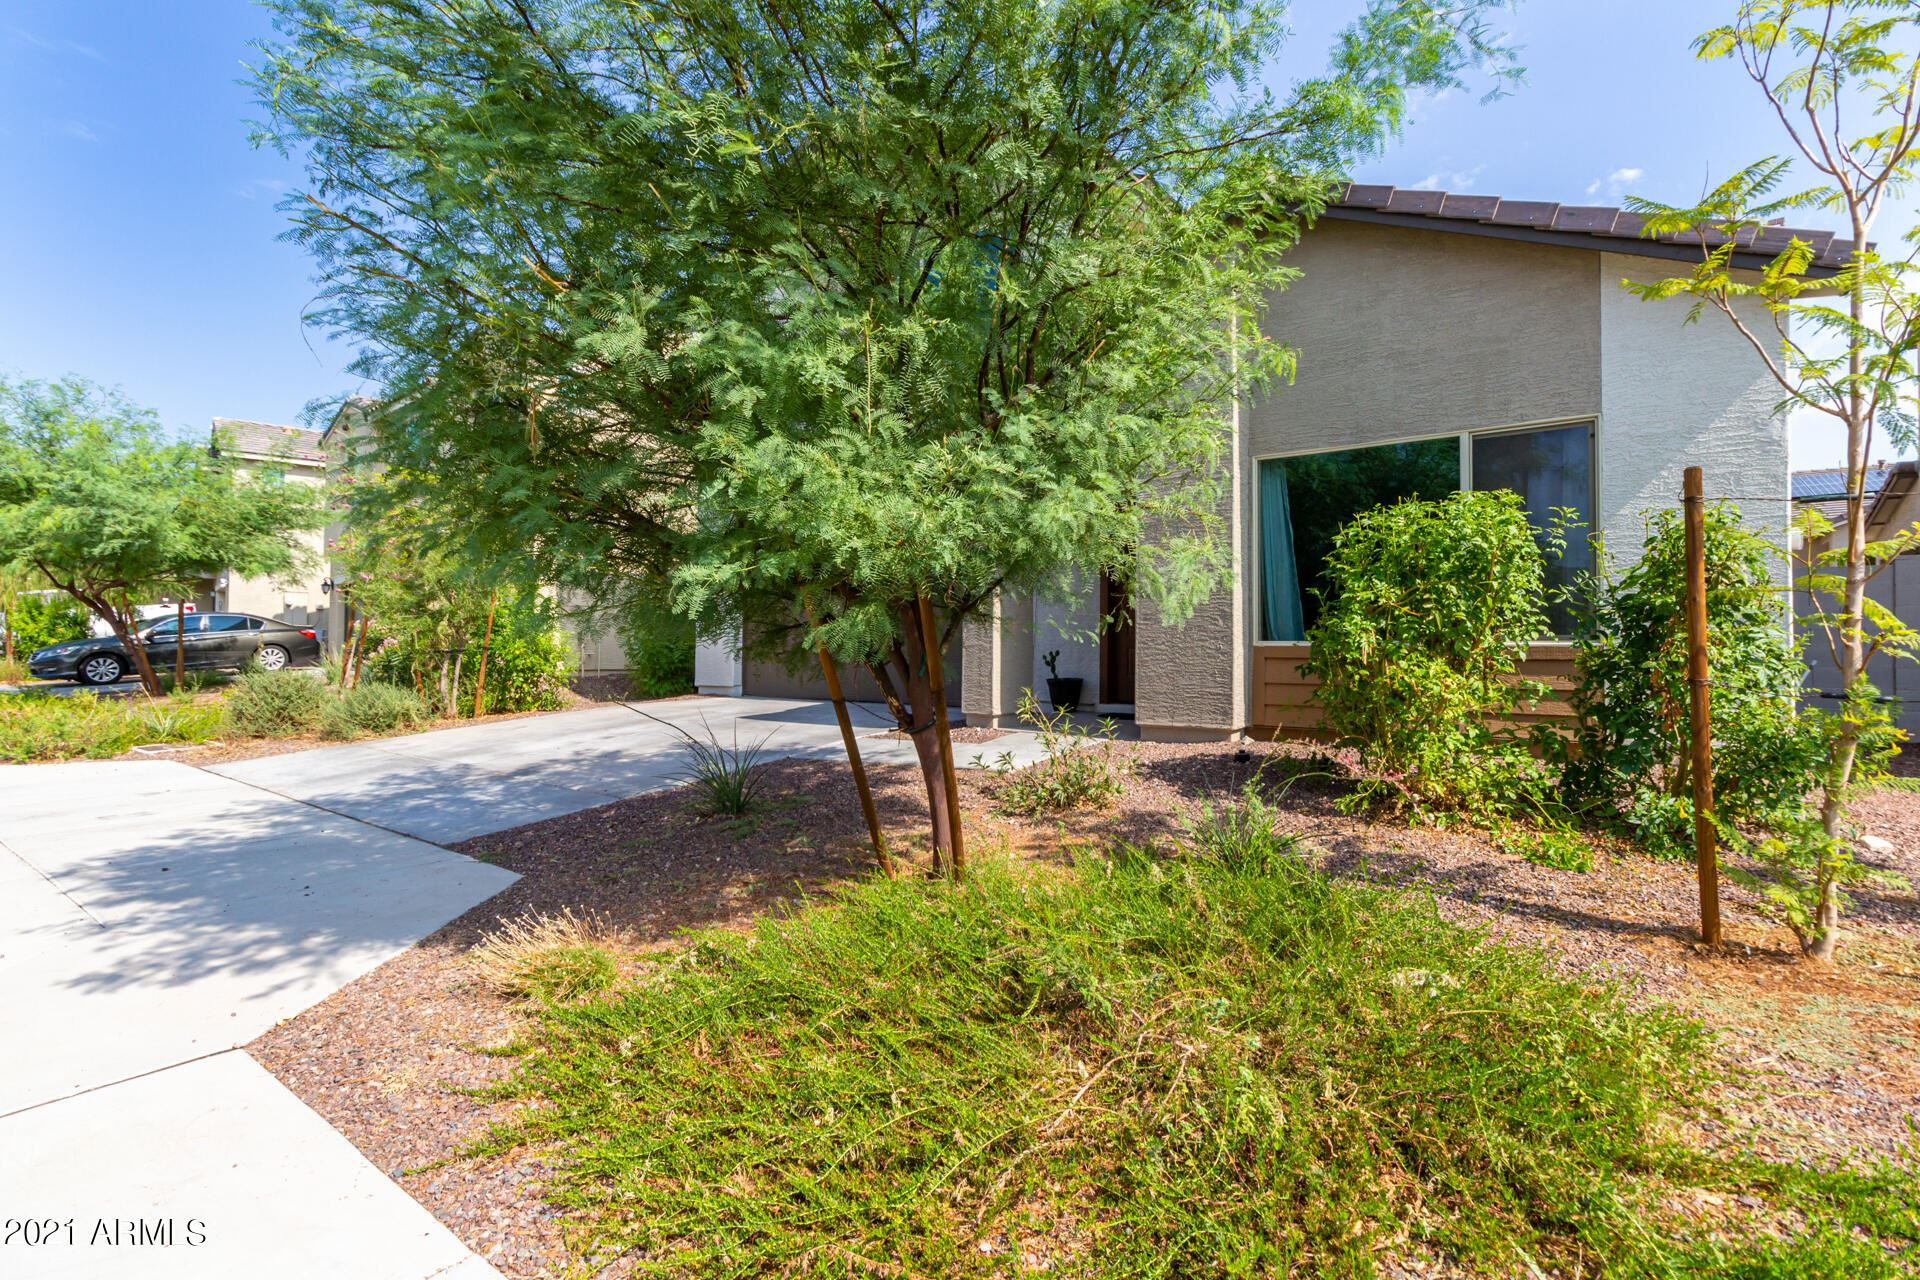 Photo of 21158 W HOLLY Street, Buckeye, AZ 85396 (MLS # 6265581)